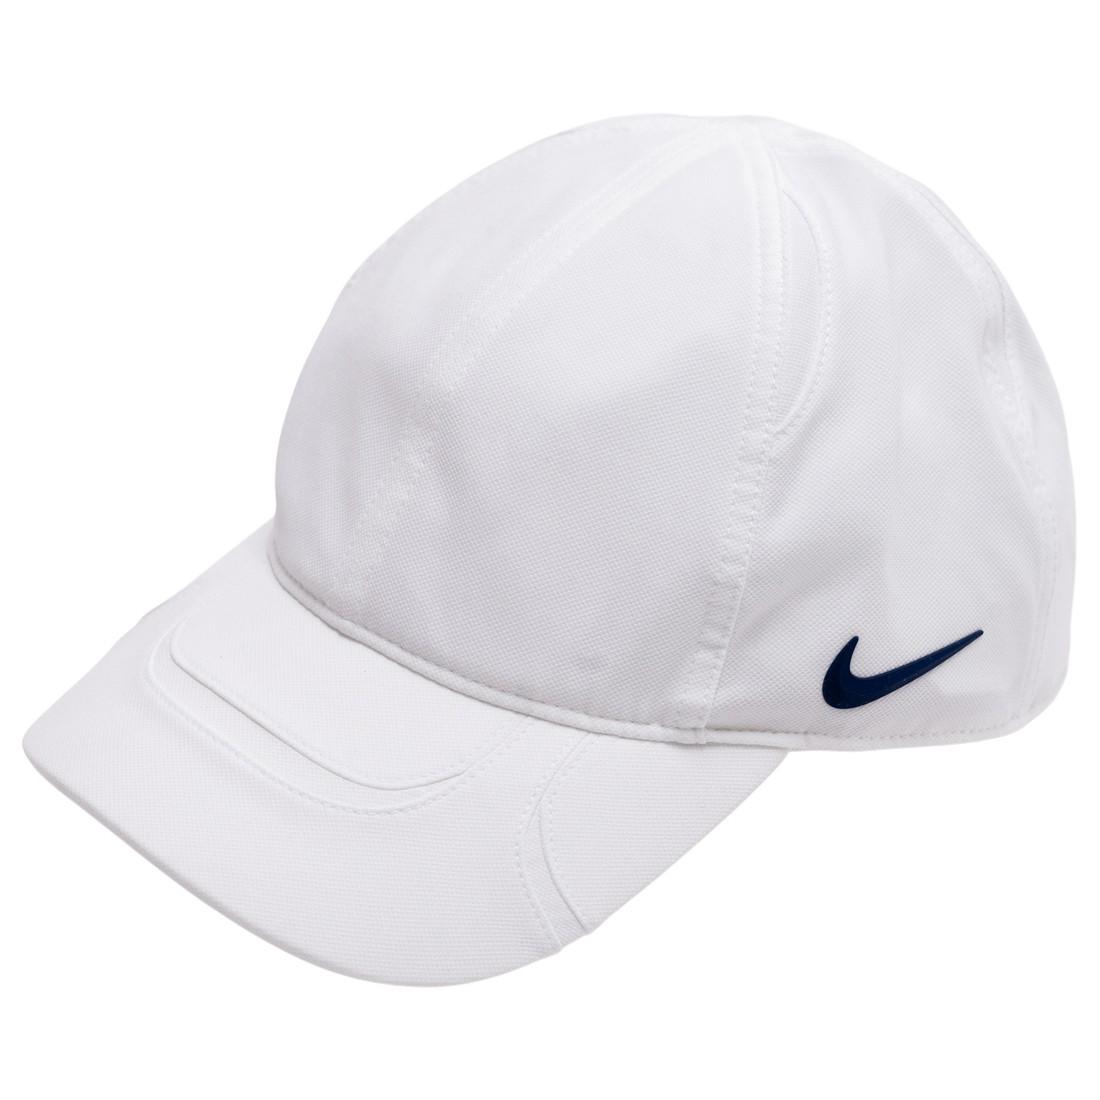 Nike Men Nocta Caps (white / blue void)